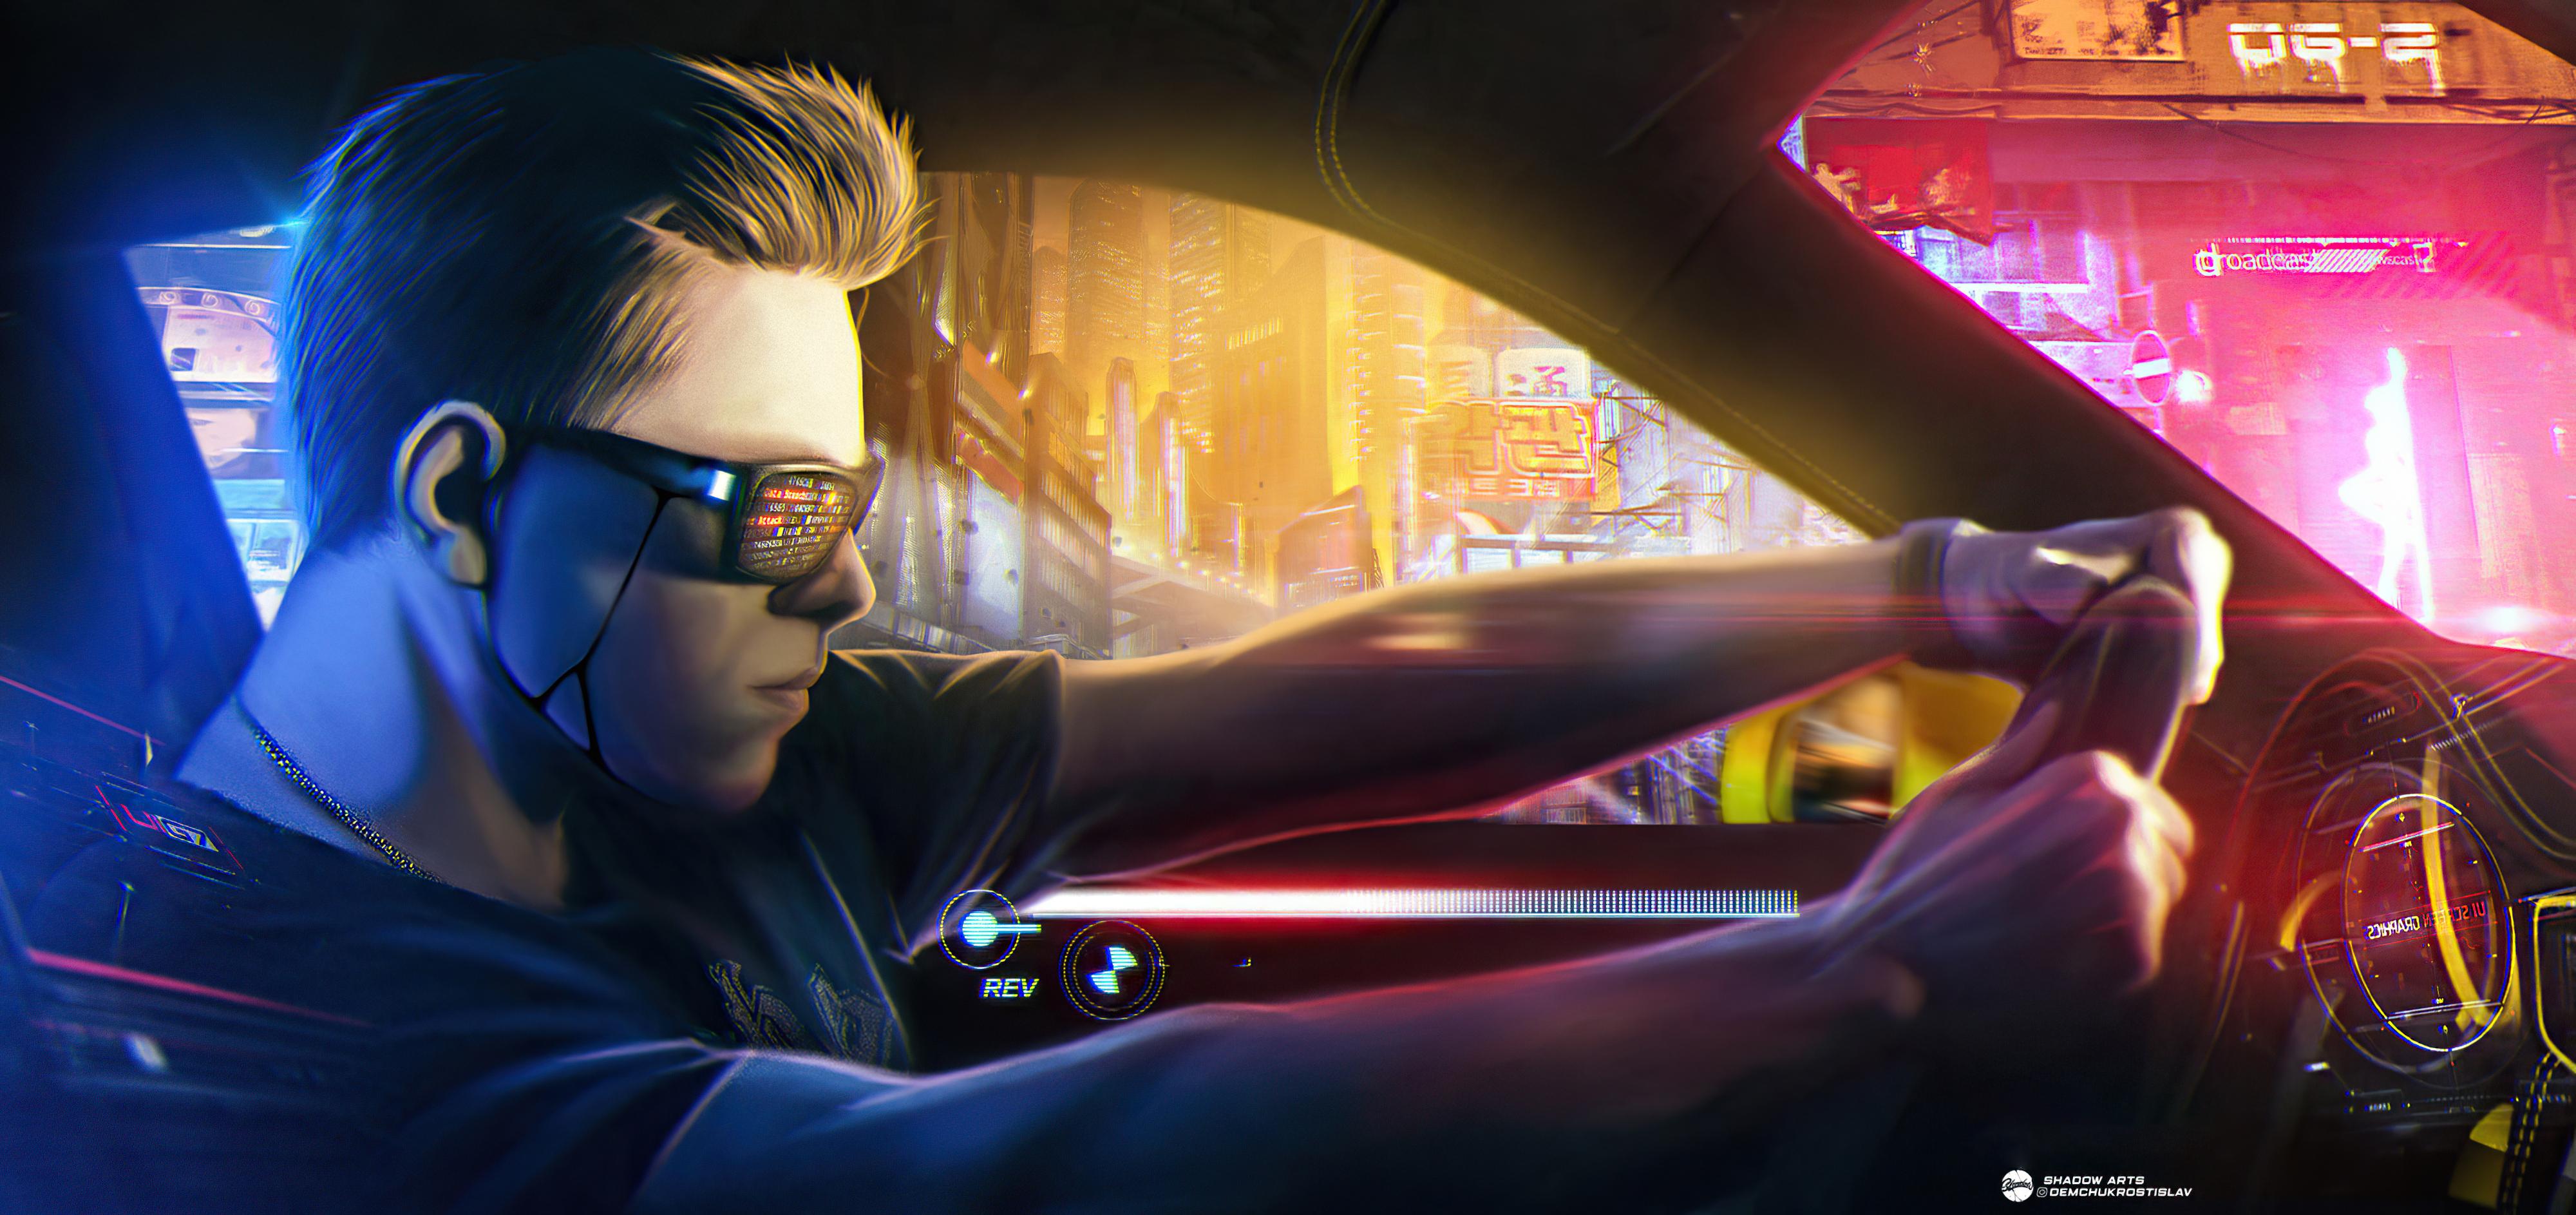 cyberpunk boy car rider 4k 1618133576 - Cyberpunk Boy Car Rider 4k - Cyberpunk Boy Car Rider 4k wallpapers